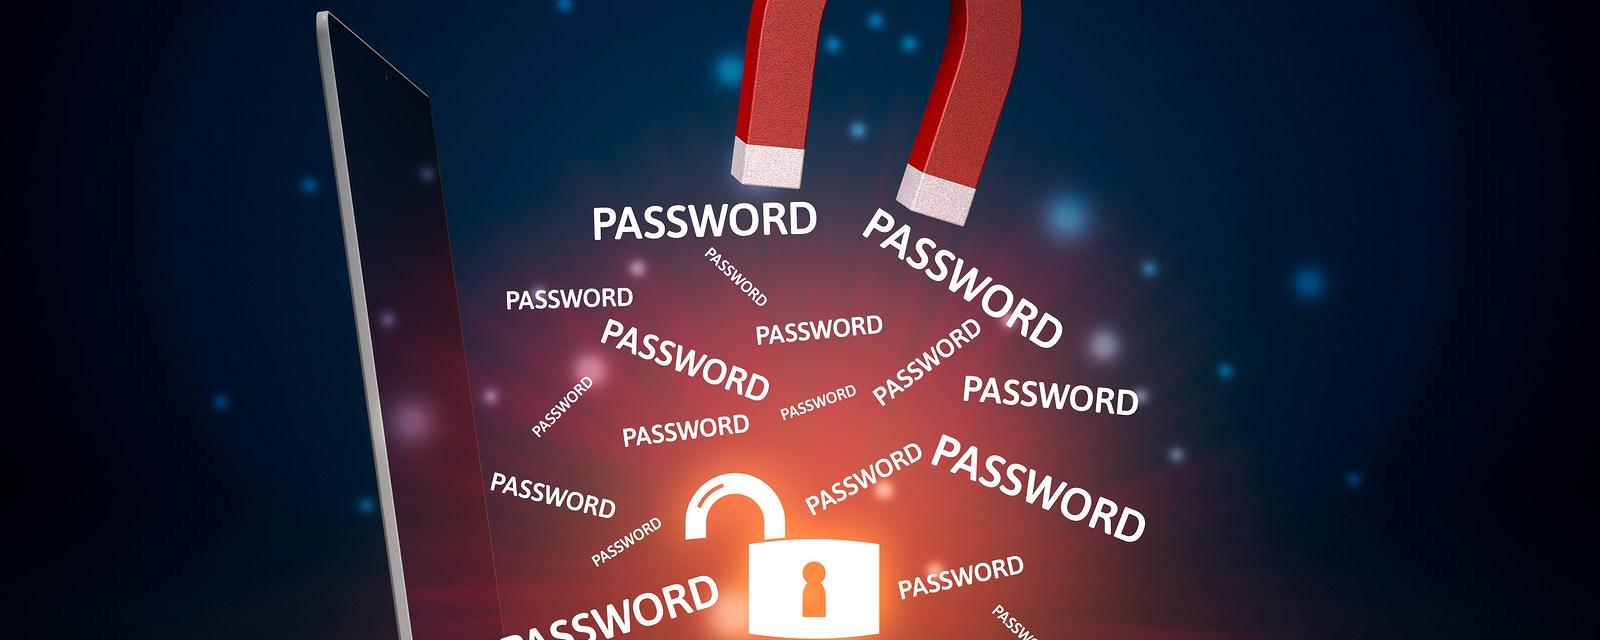 Types of Password Attacks